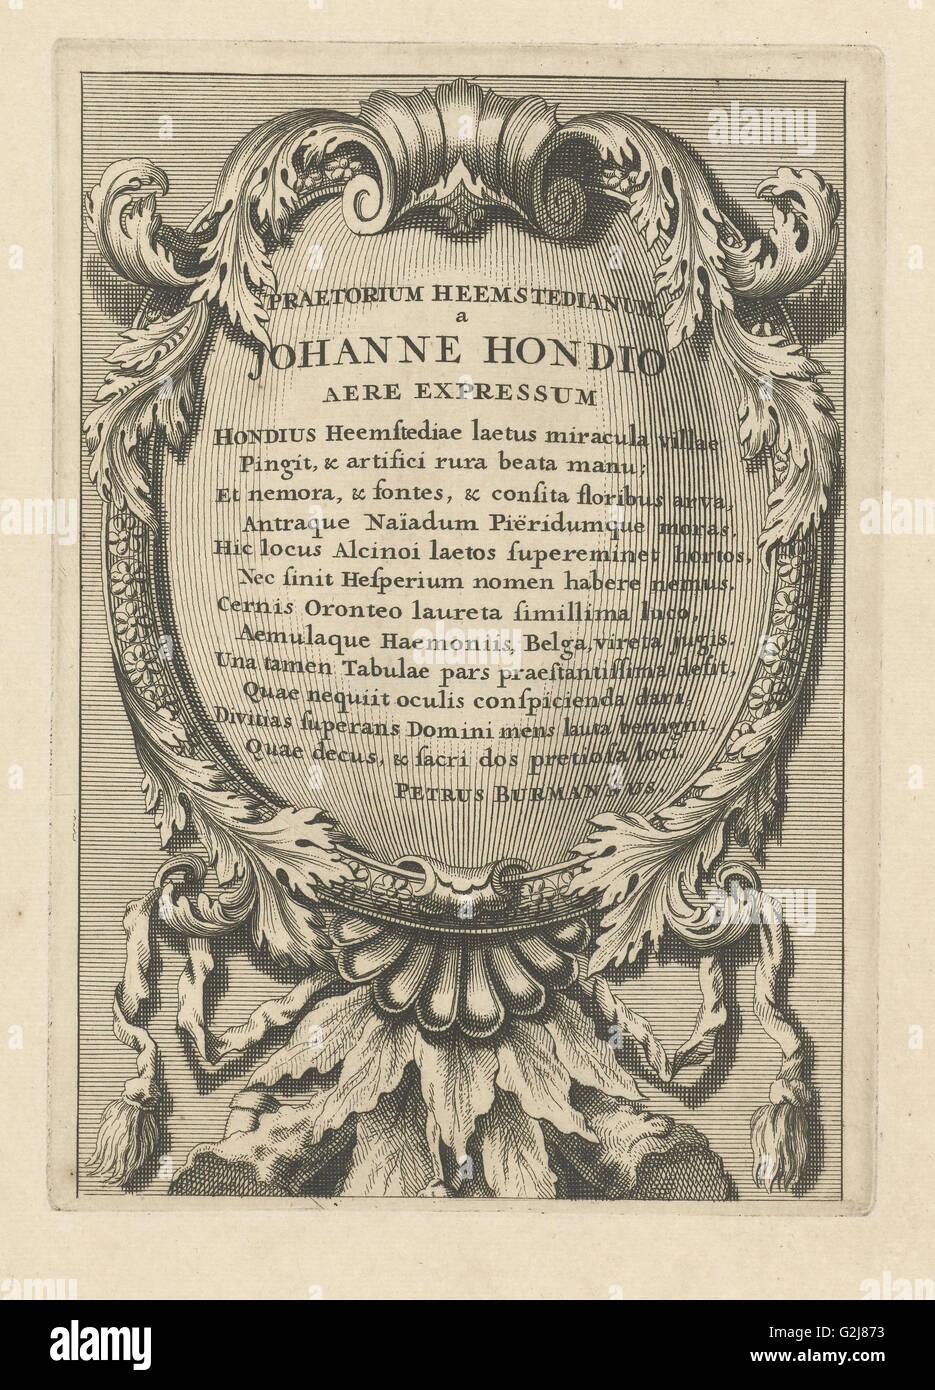 Cartouche avec texte latin, Johannes Hondius, Pieter Burman, 1700 - 1799 Photo Stock